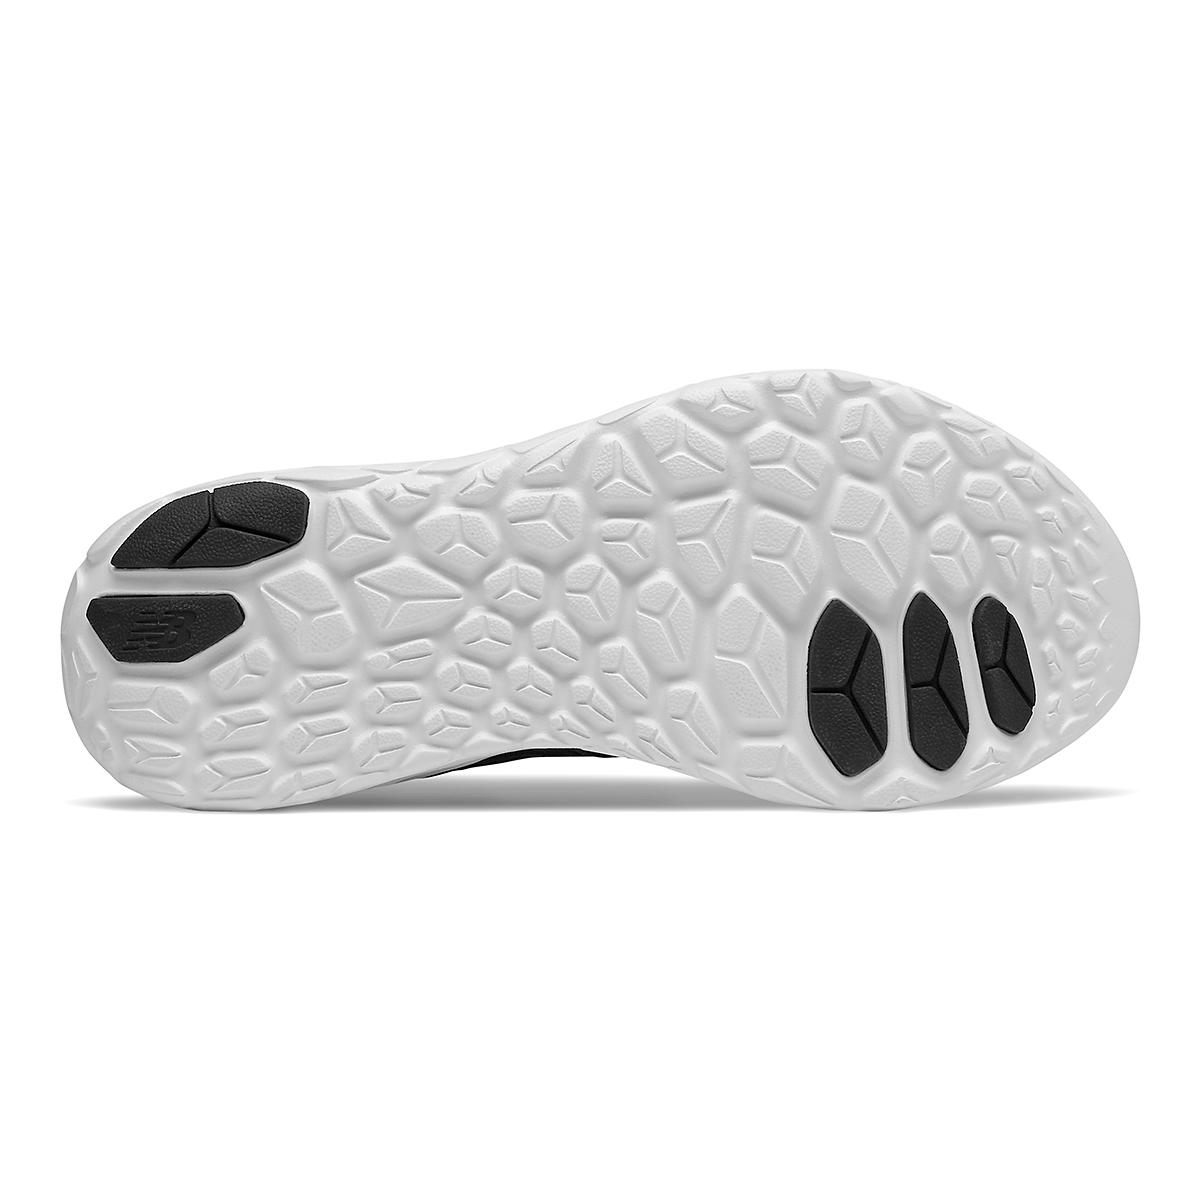 Women's New Balance Beacon V3 Running Shoe - Color: Black - Size: 6.5 - Width: Regular, Black, large, image 3